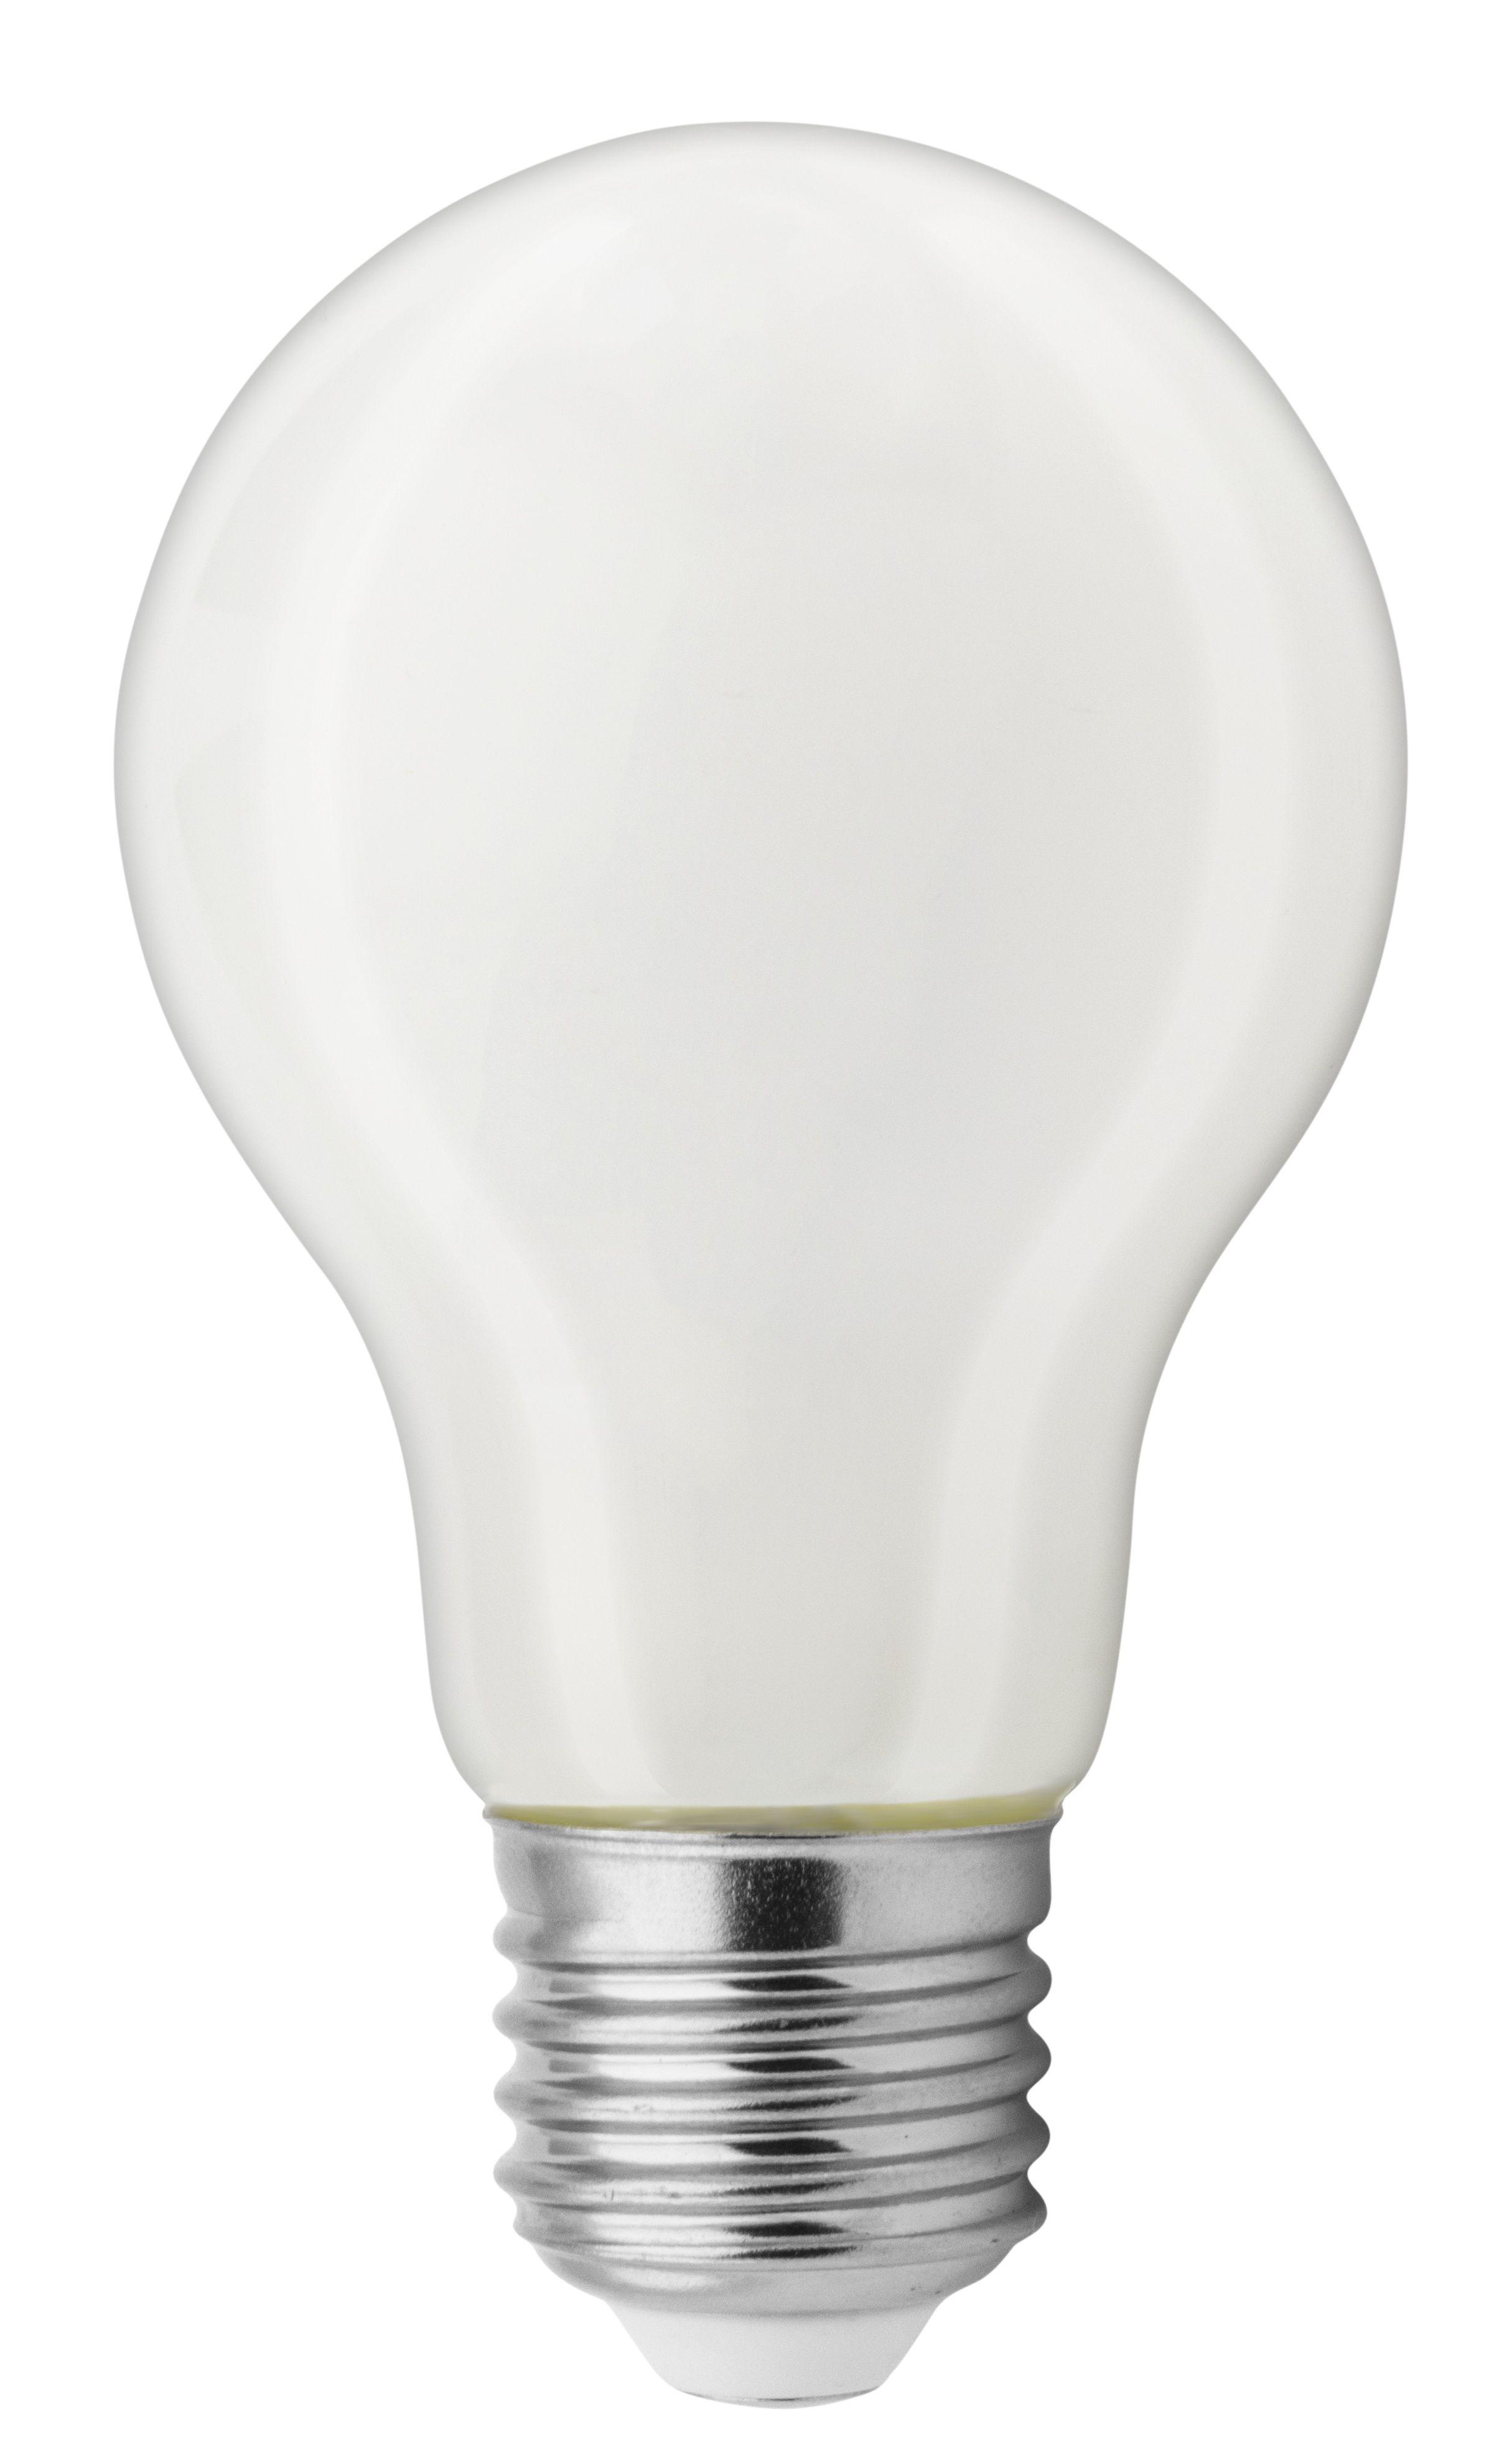 GE Lyspære LED Glass Norm. 4,5W E27 93046029 (Kan sendes i brev)